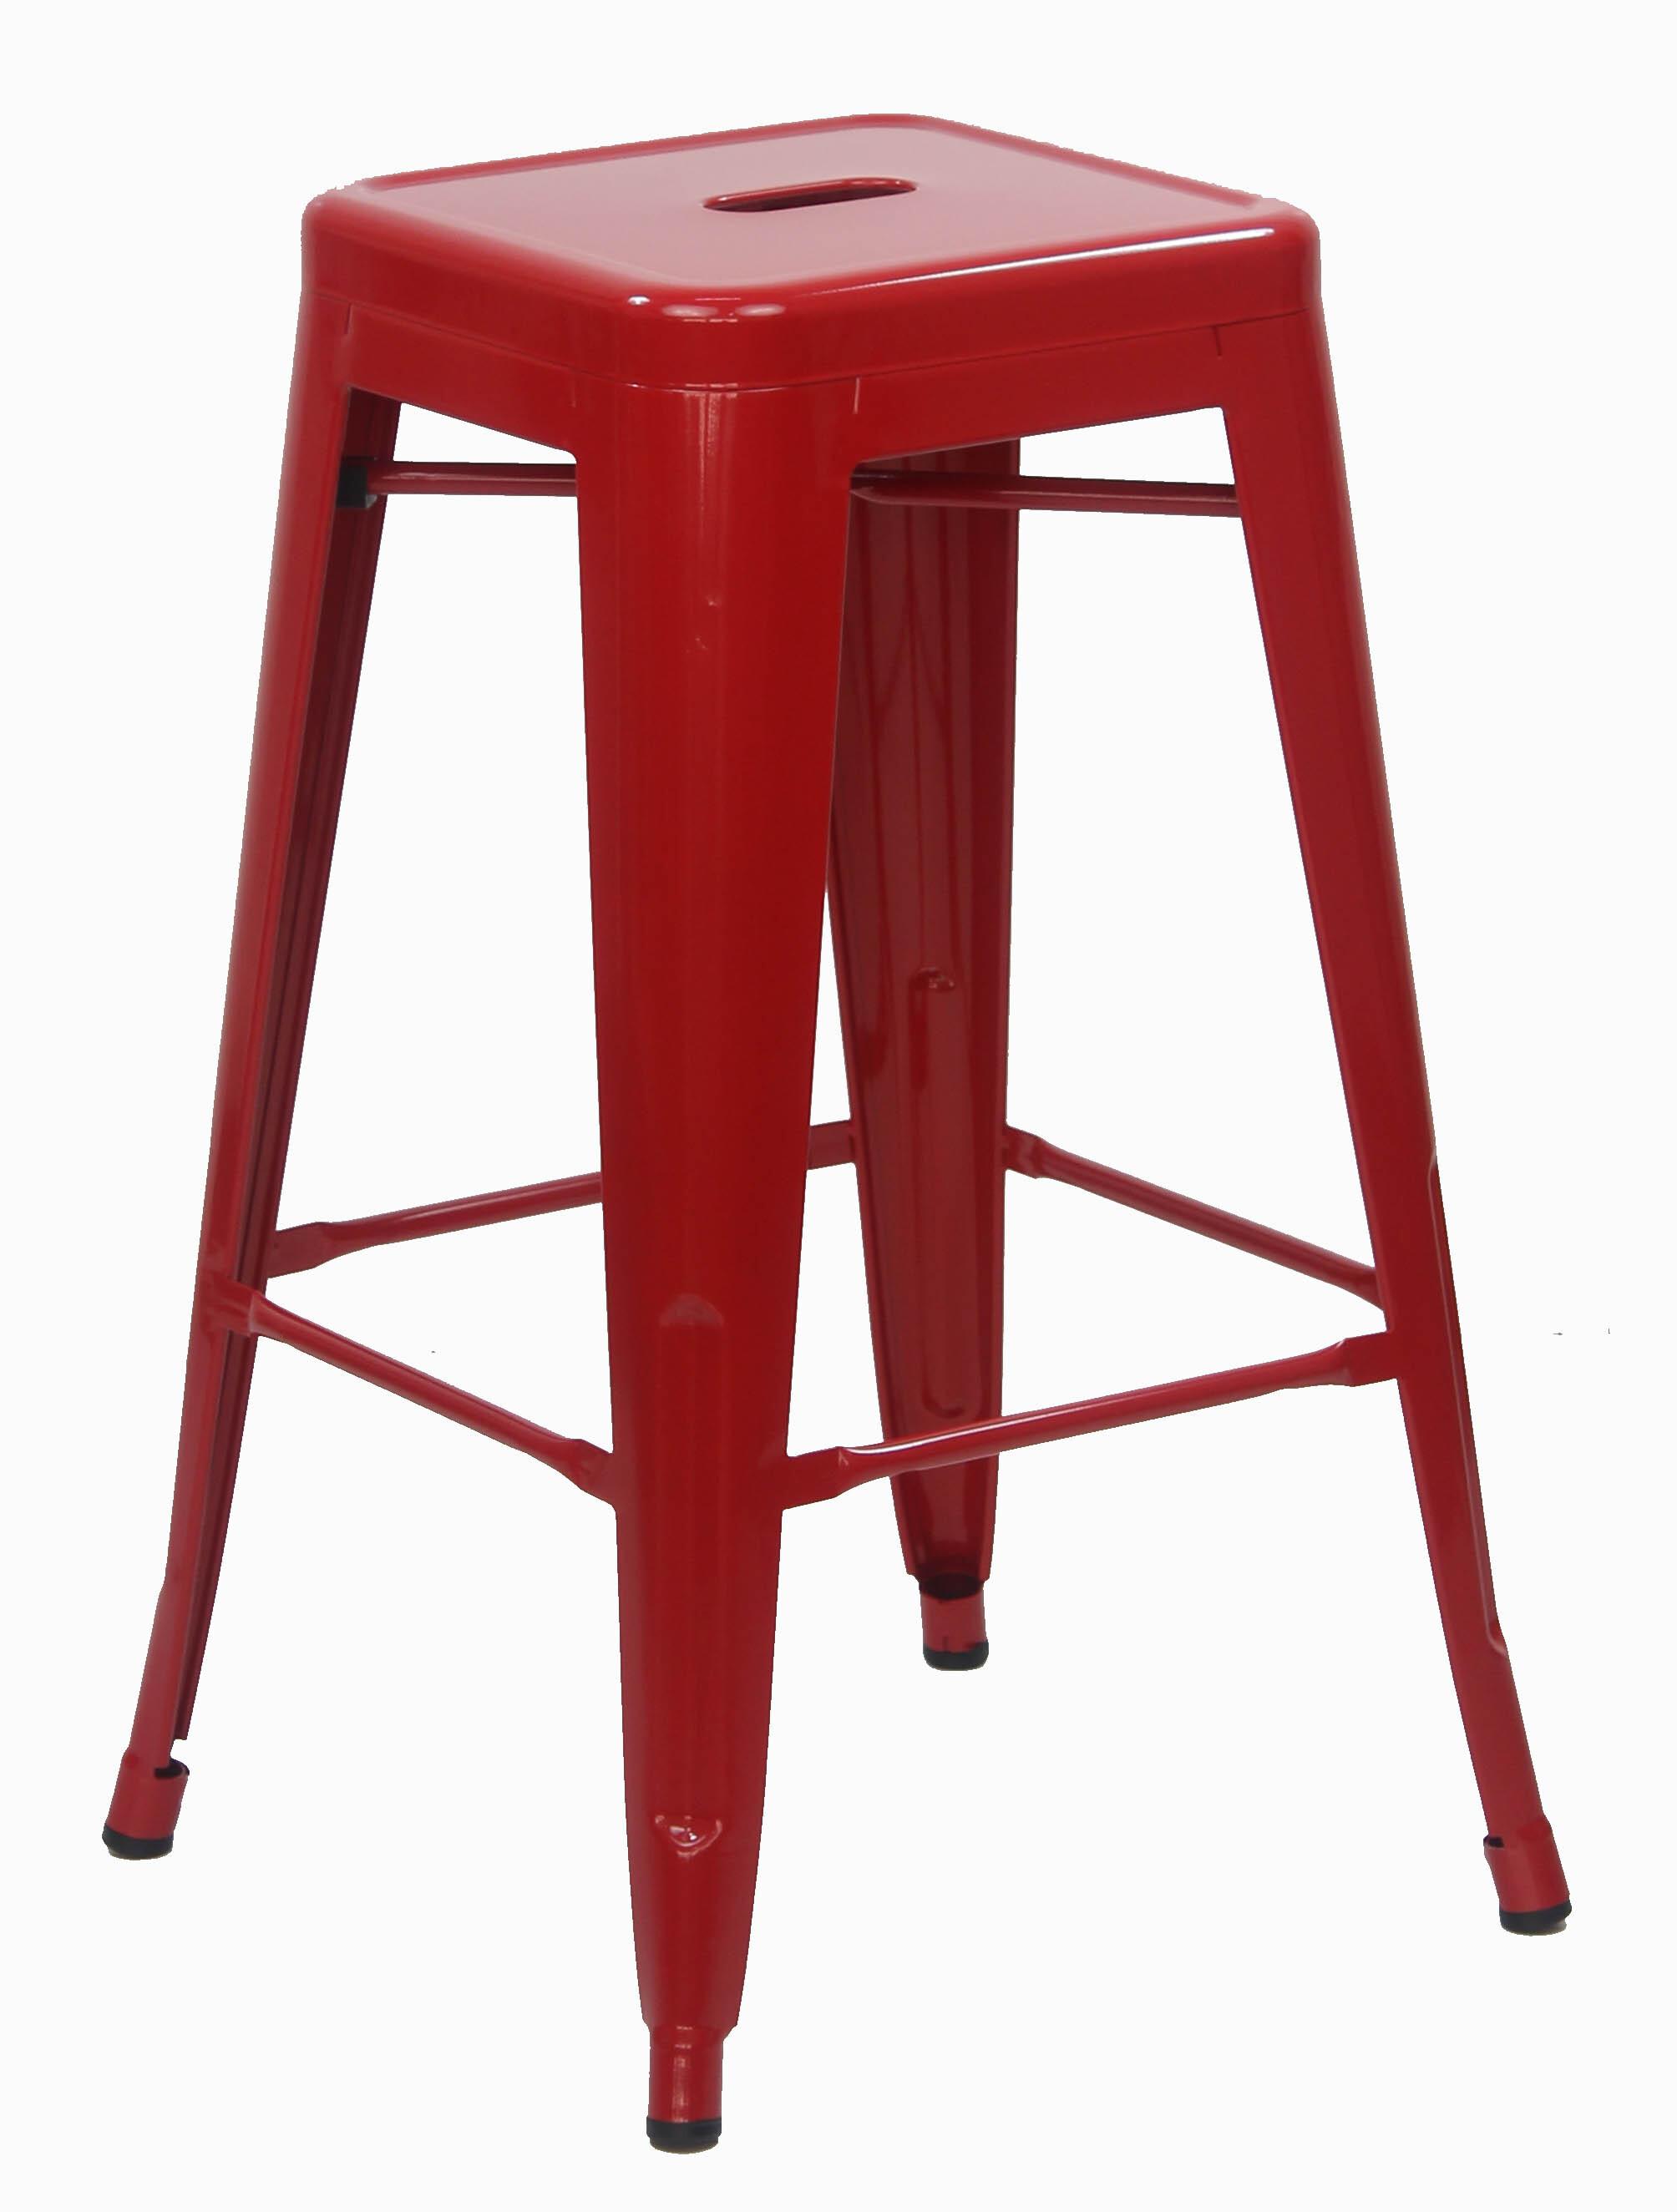 Retro Metal Medium Stool Red Chairs Seating Furniture Living Room Furniture Furniture